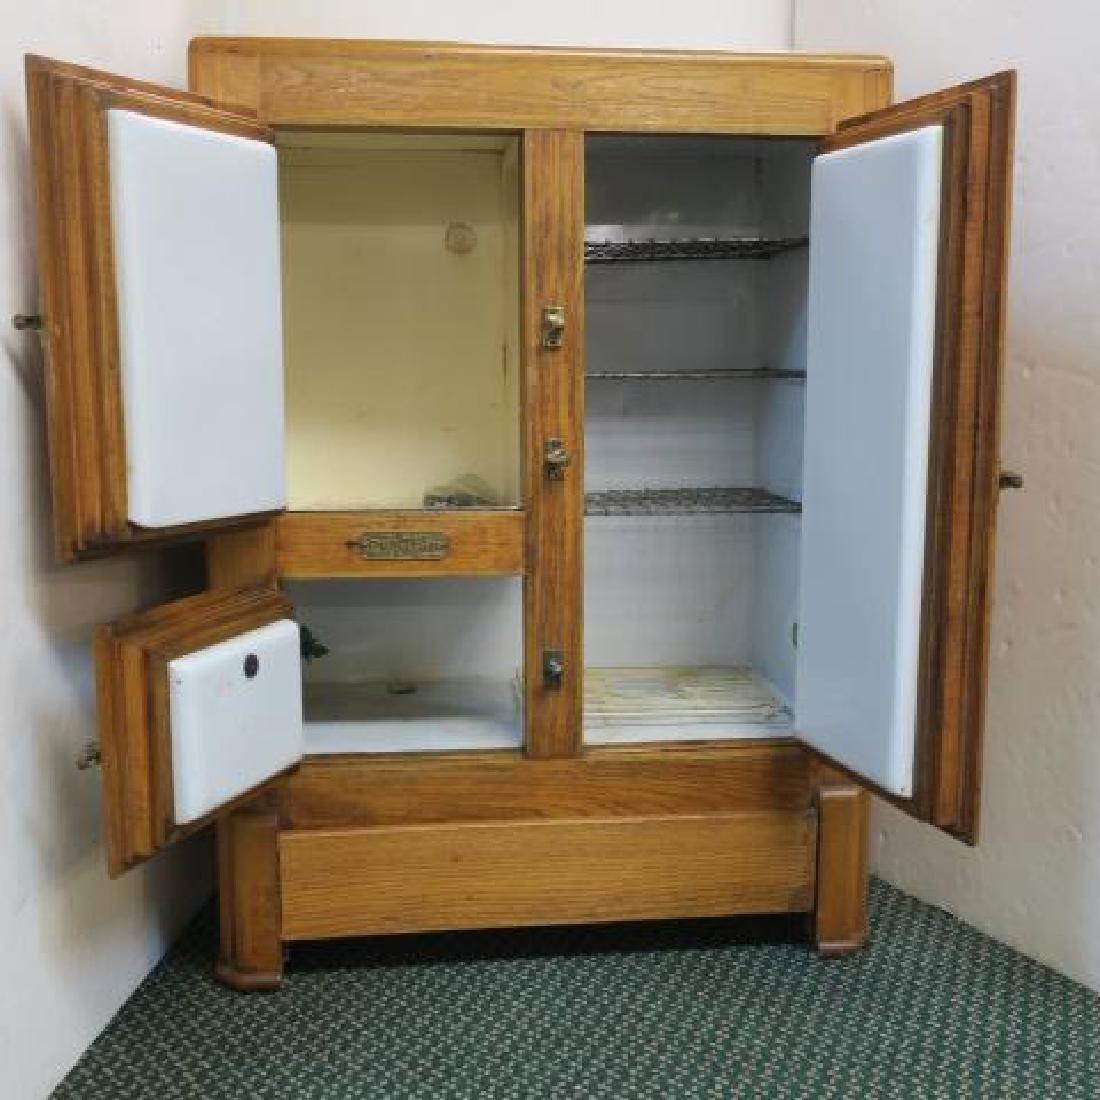 L H MACE Co. Puritan Oak Ice Box: - 3